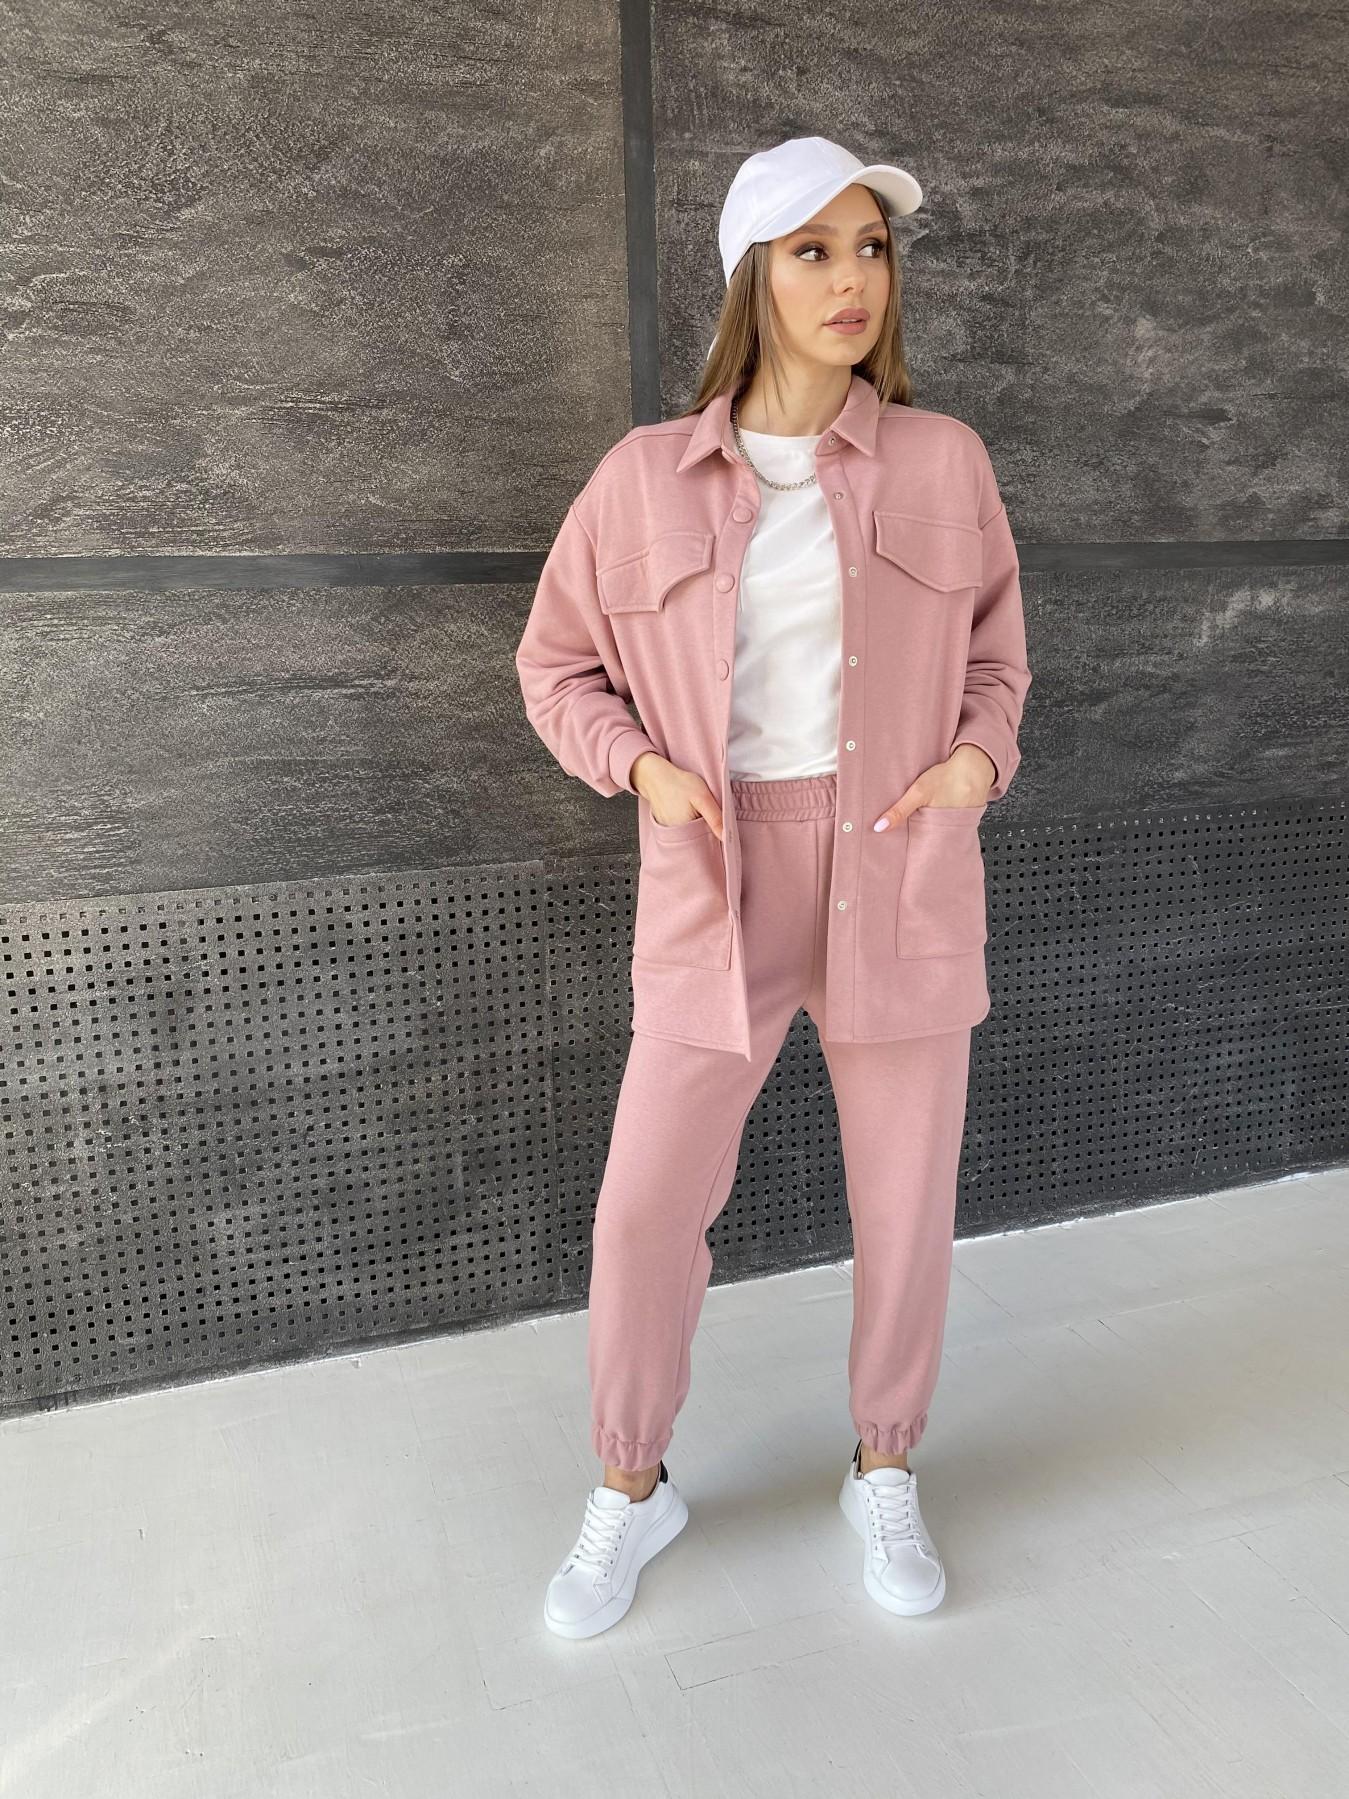 Респект костюм из трикотажа  3х нитка 11055 АРТ. 47574 Цвет: Пудра - фото 4, интернет магазин tm-modus.ru